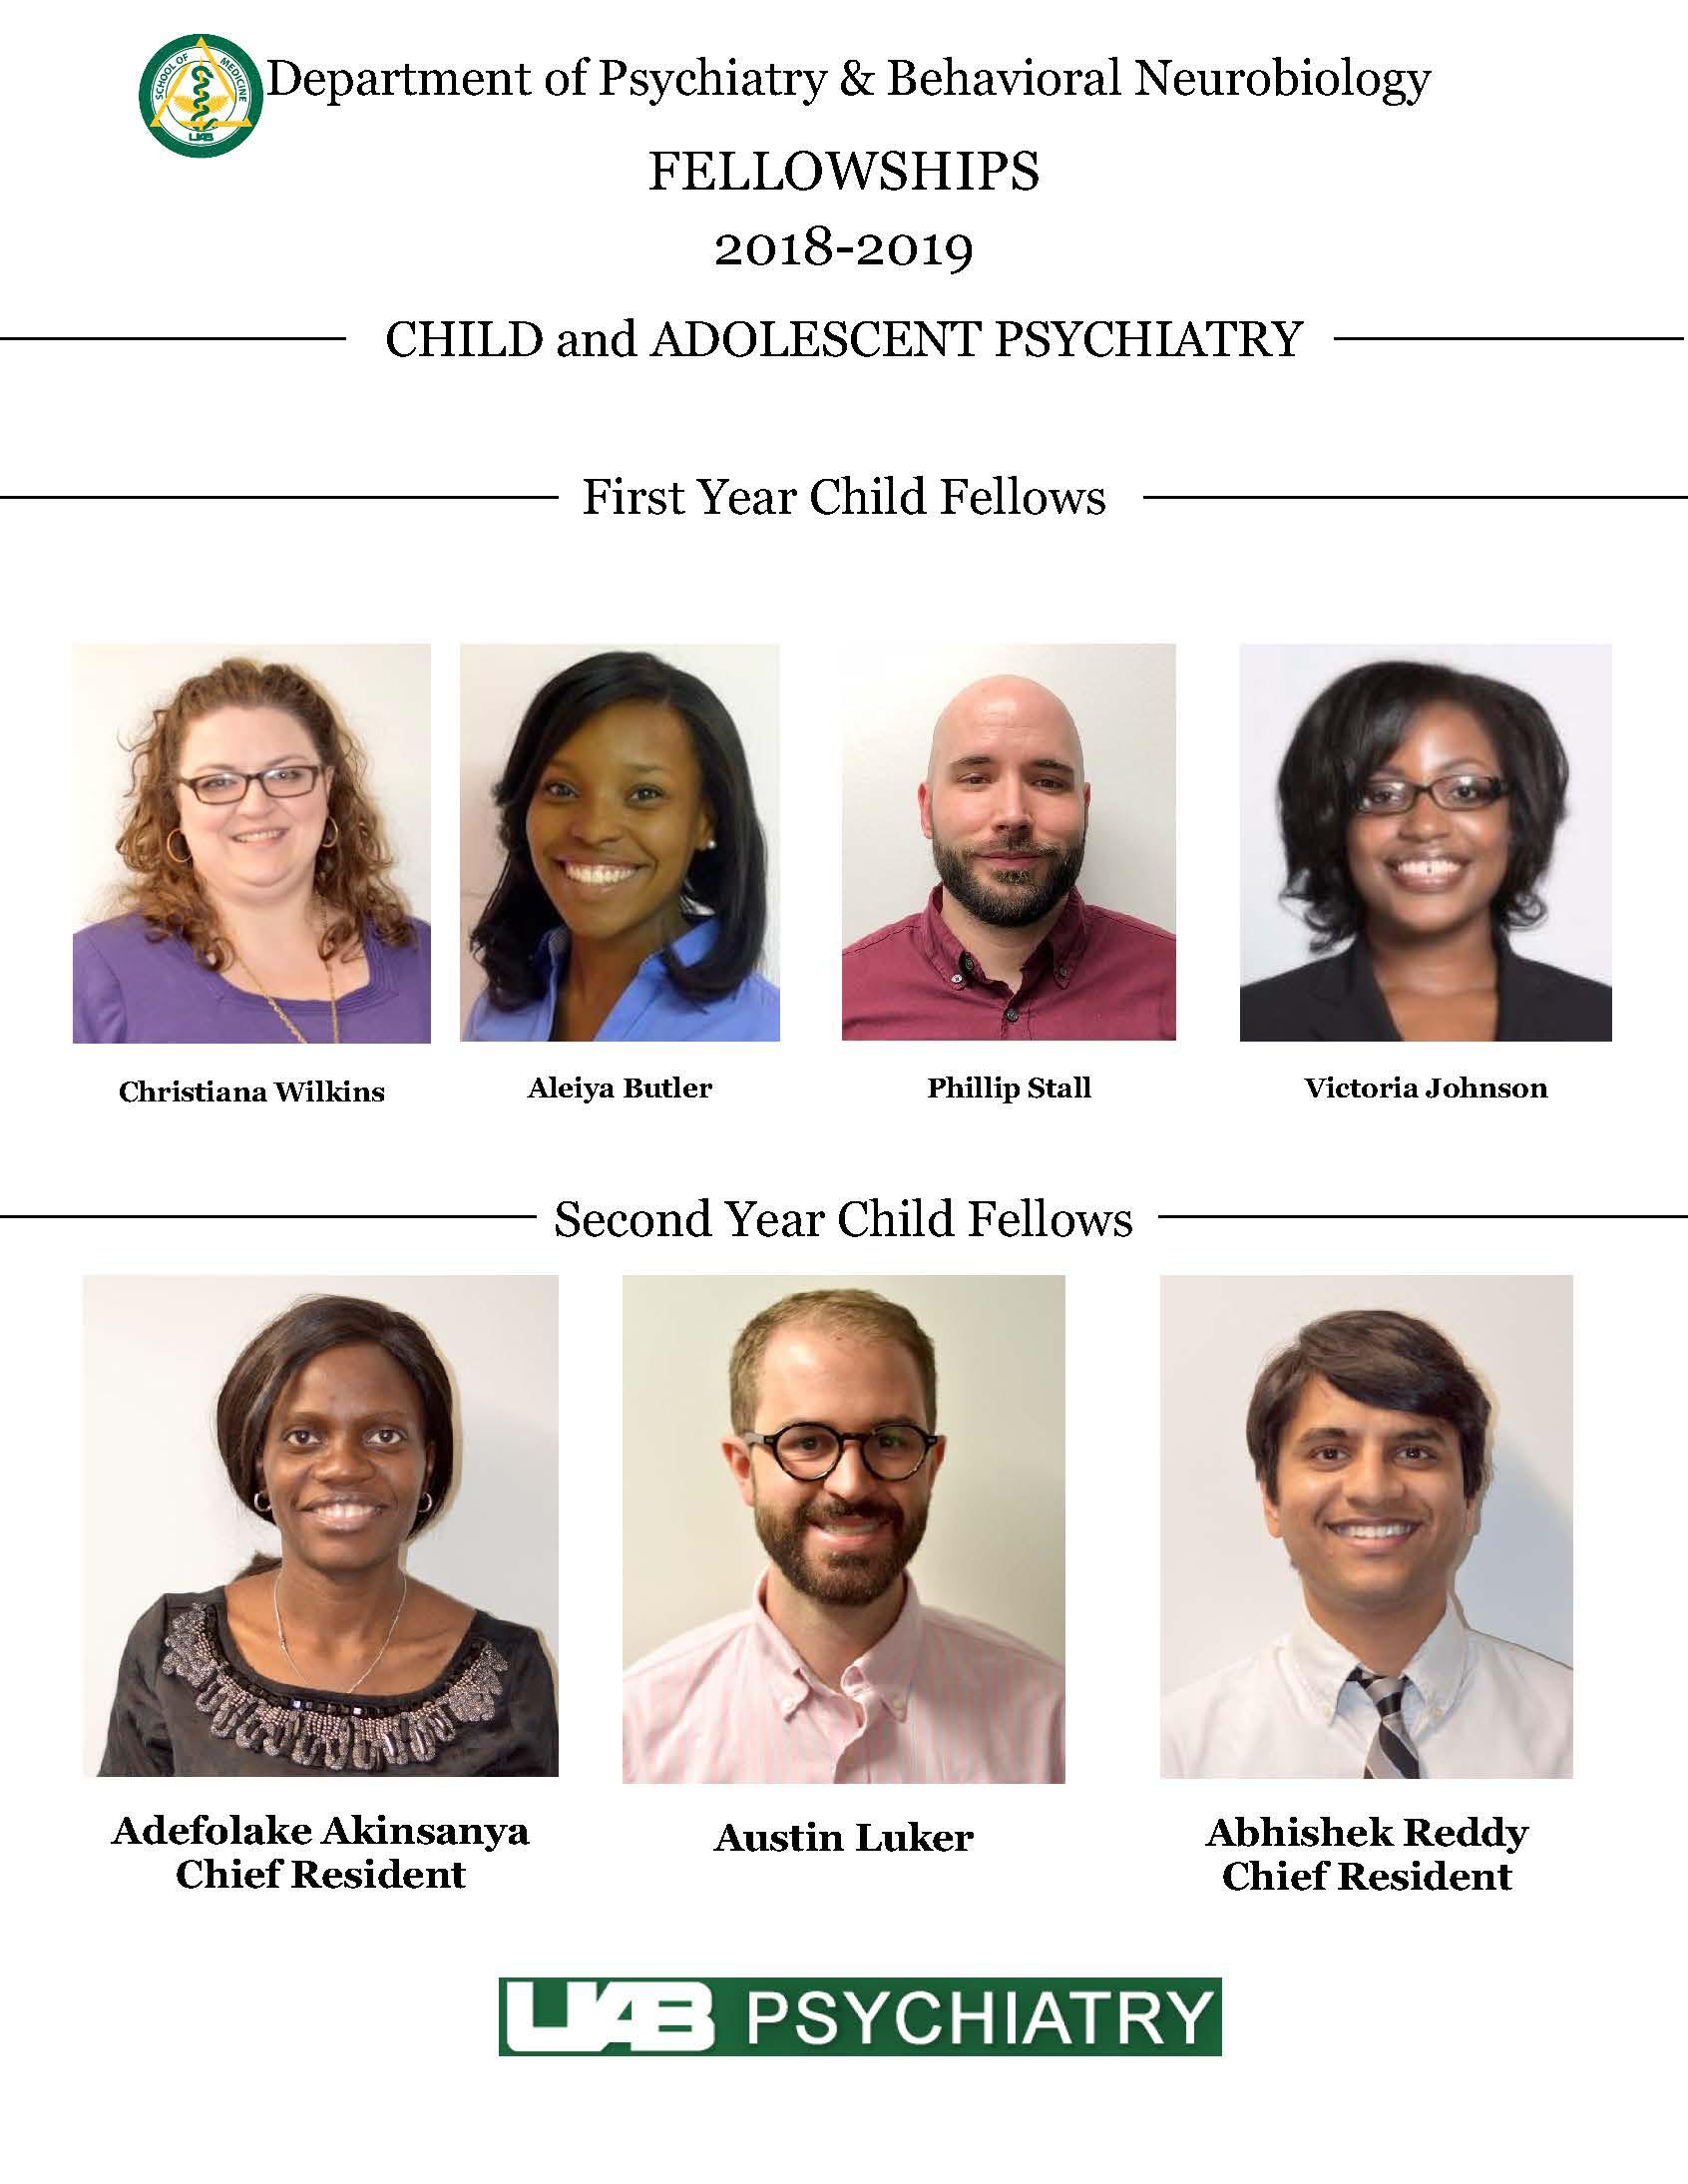 UAB - School of Medicine - Psychiatry and Behavioral